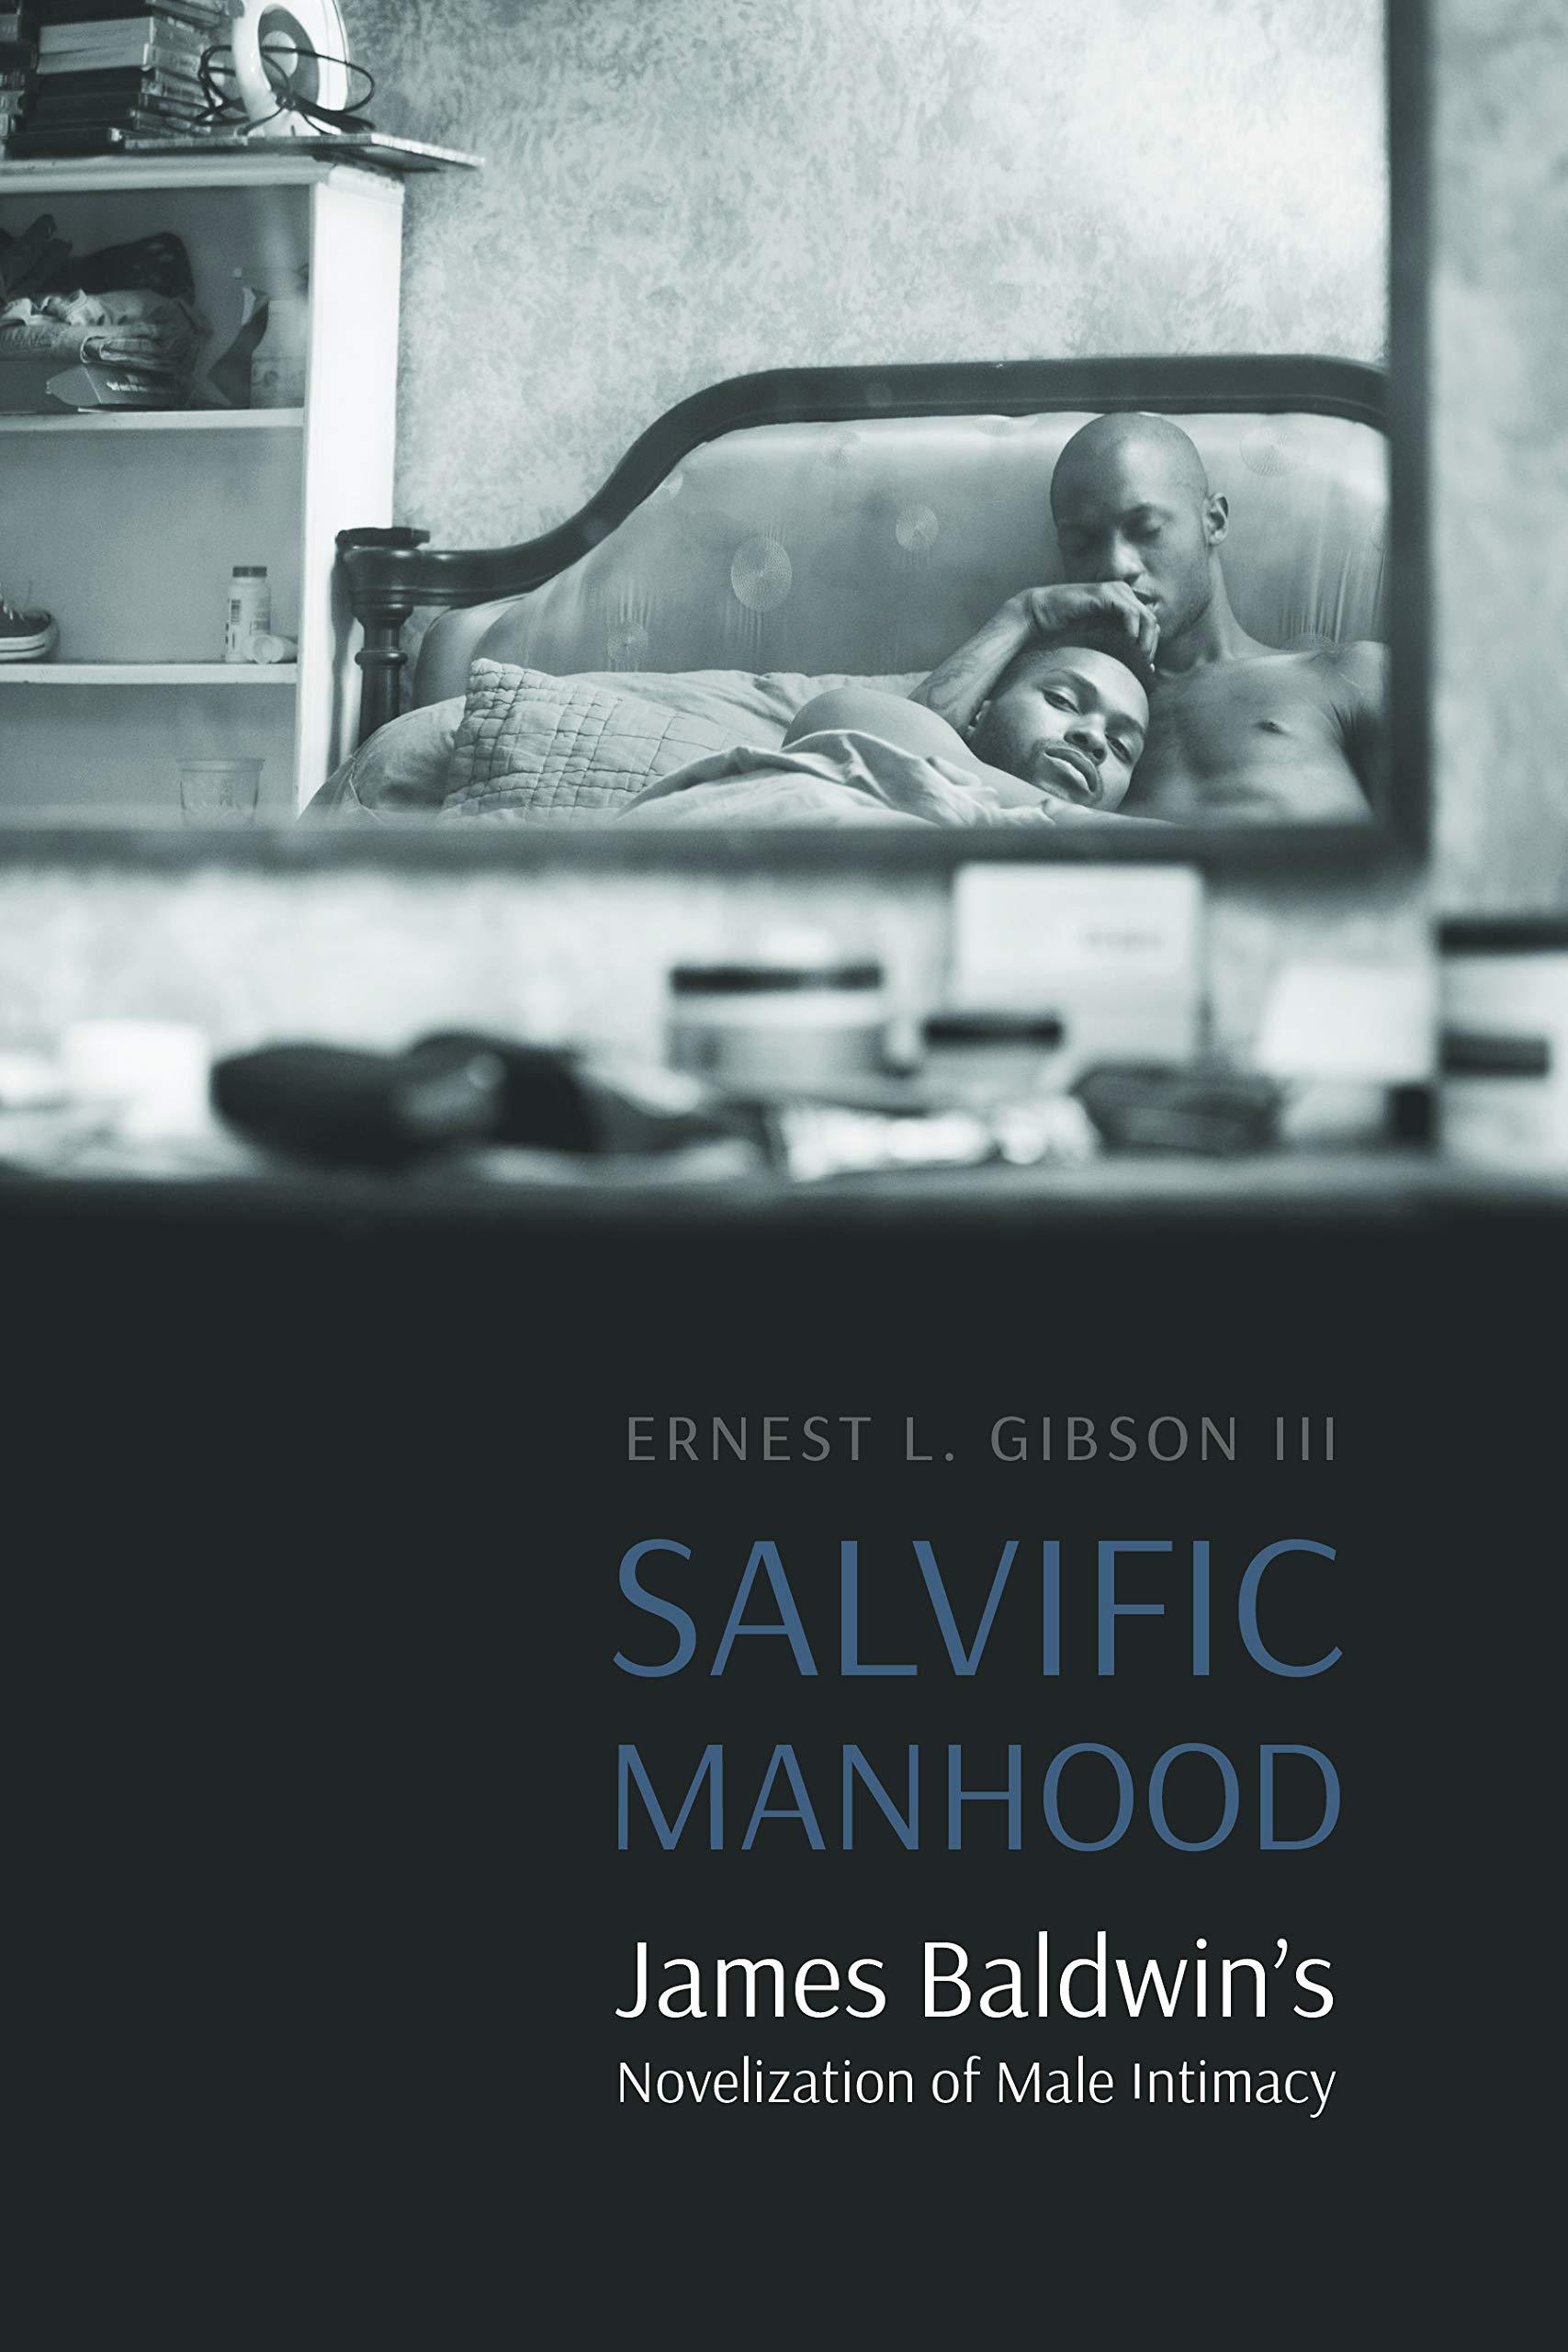 Intricacies Of Manhood